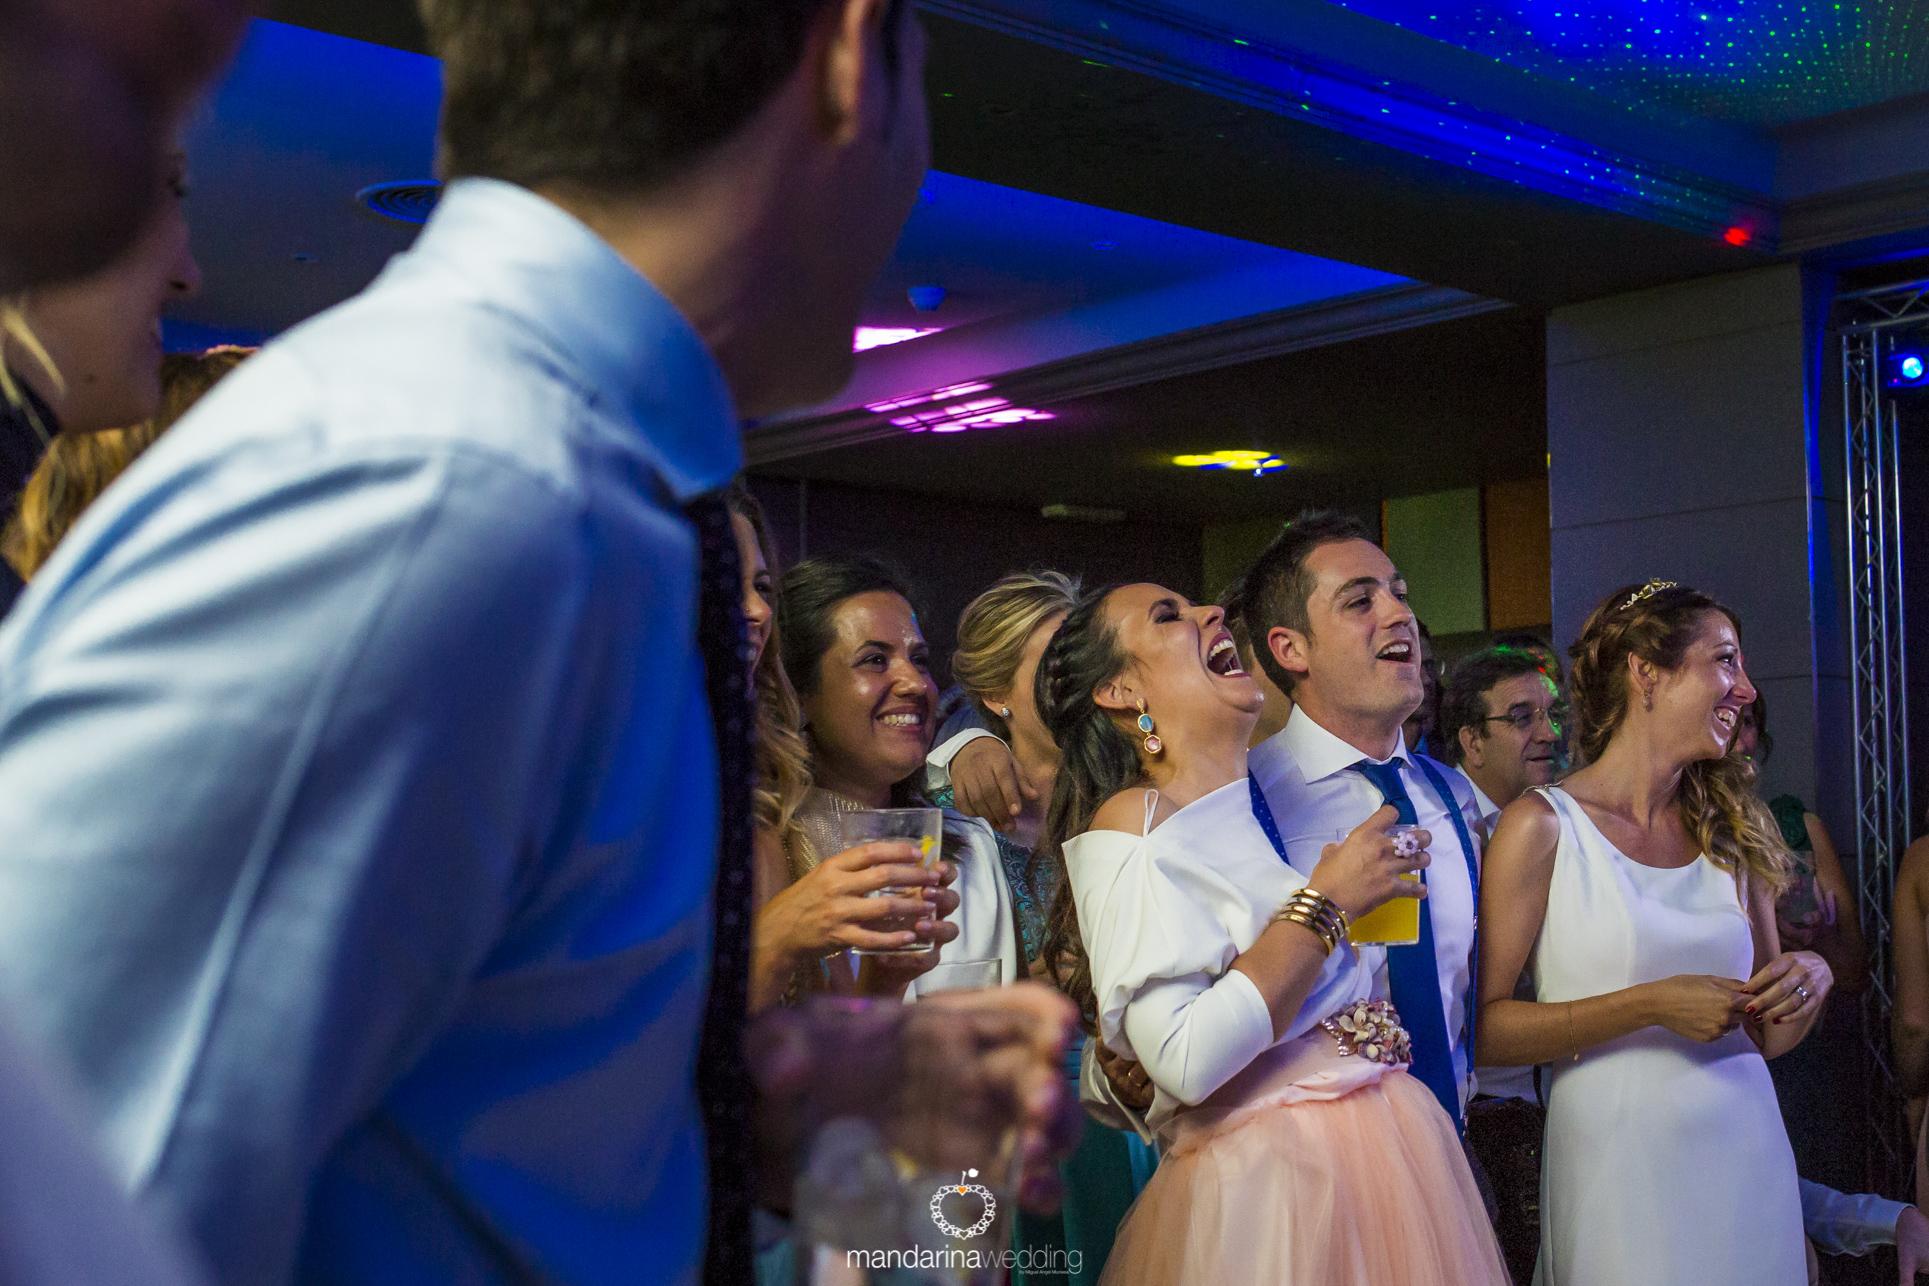 mandarina wedding, fotografo boda pais vasco, fotografo boda zaragoza, fotógrafo boda soria, fotografo boda Madrid, fotógrafo boda tarragona-35